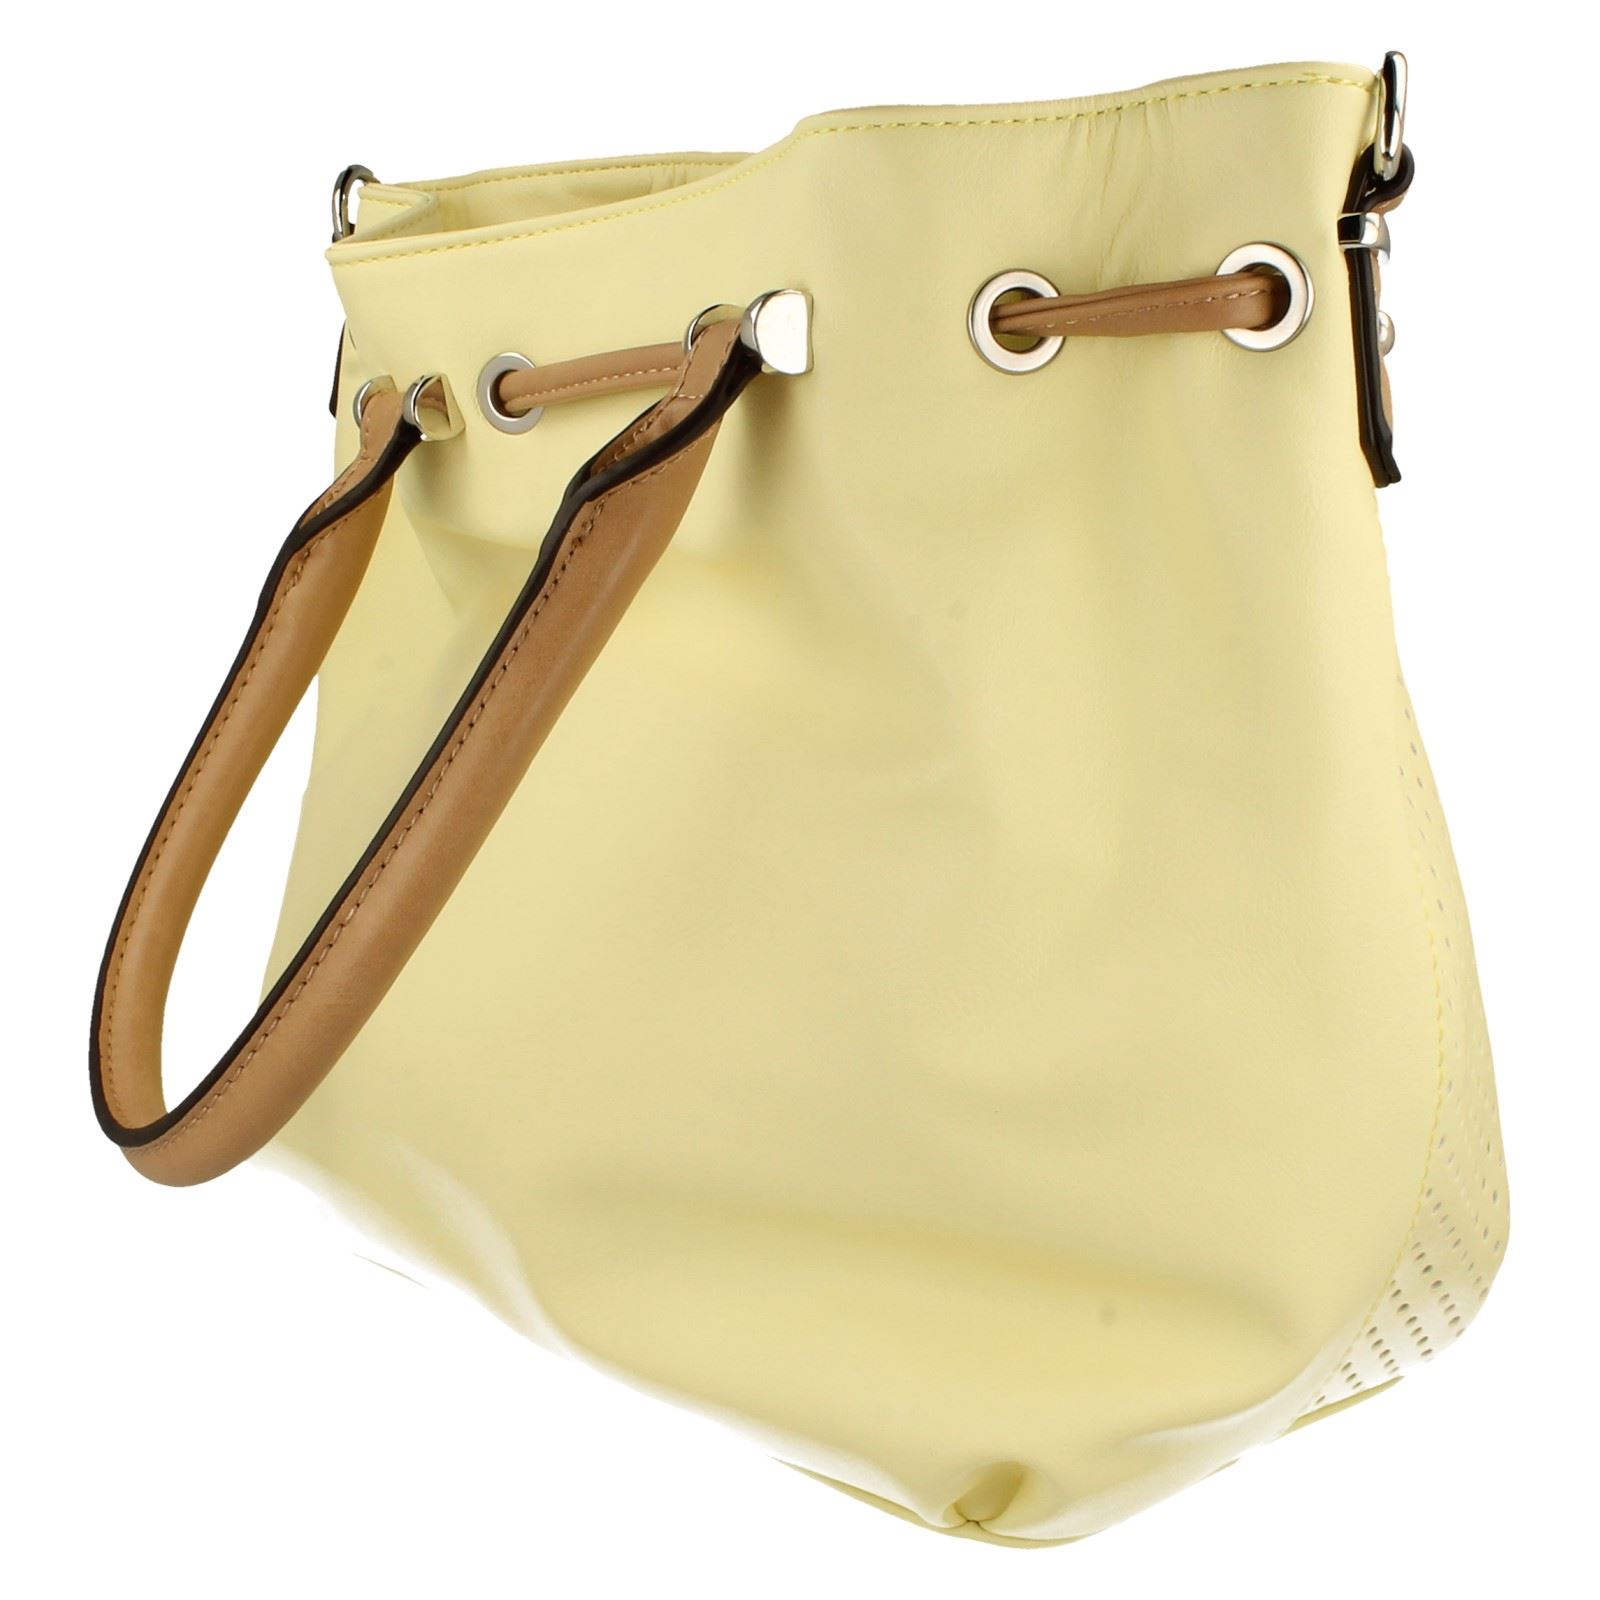 amarillo damas pálido Bolso Duffle estilo Clarks Grace Mella xq8w7w6nvZ